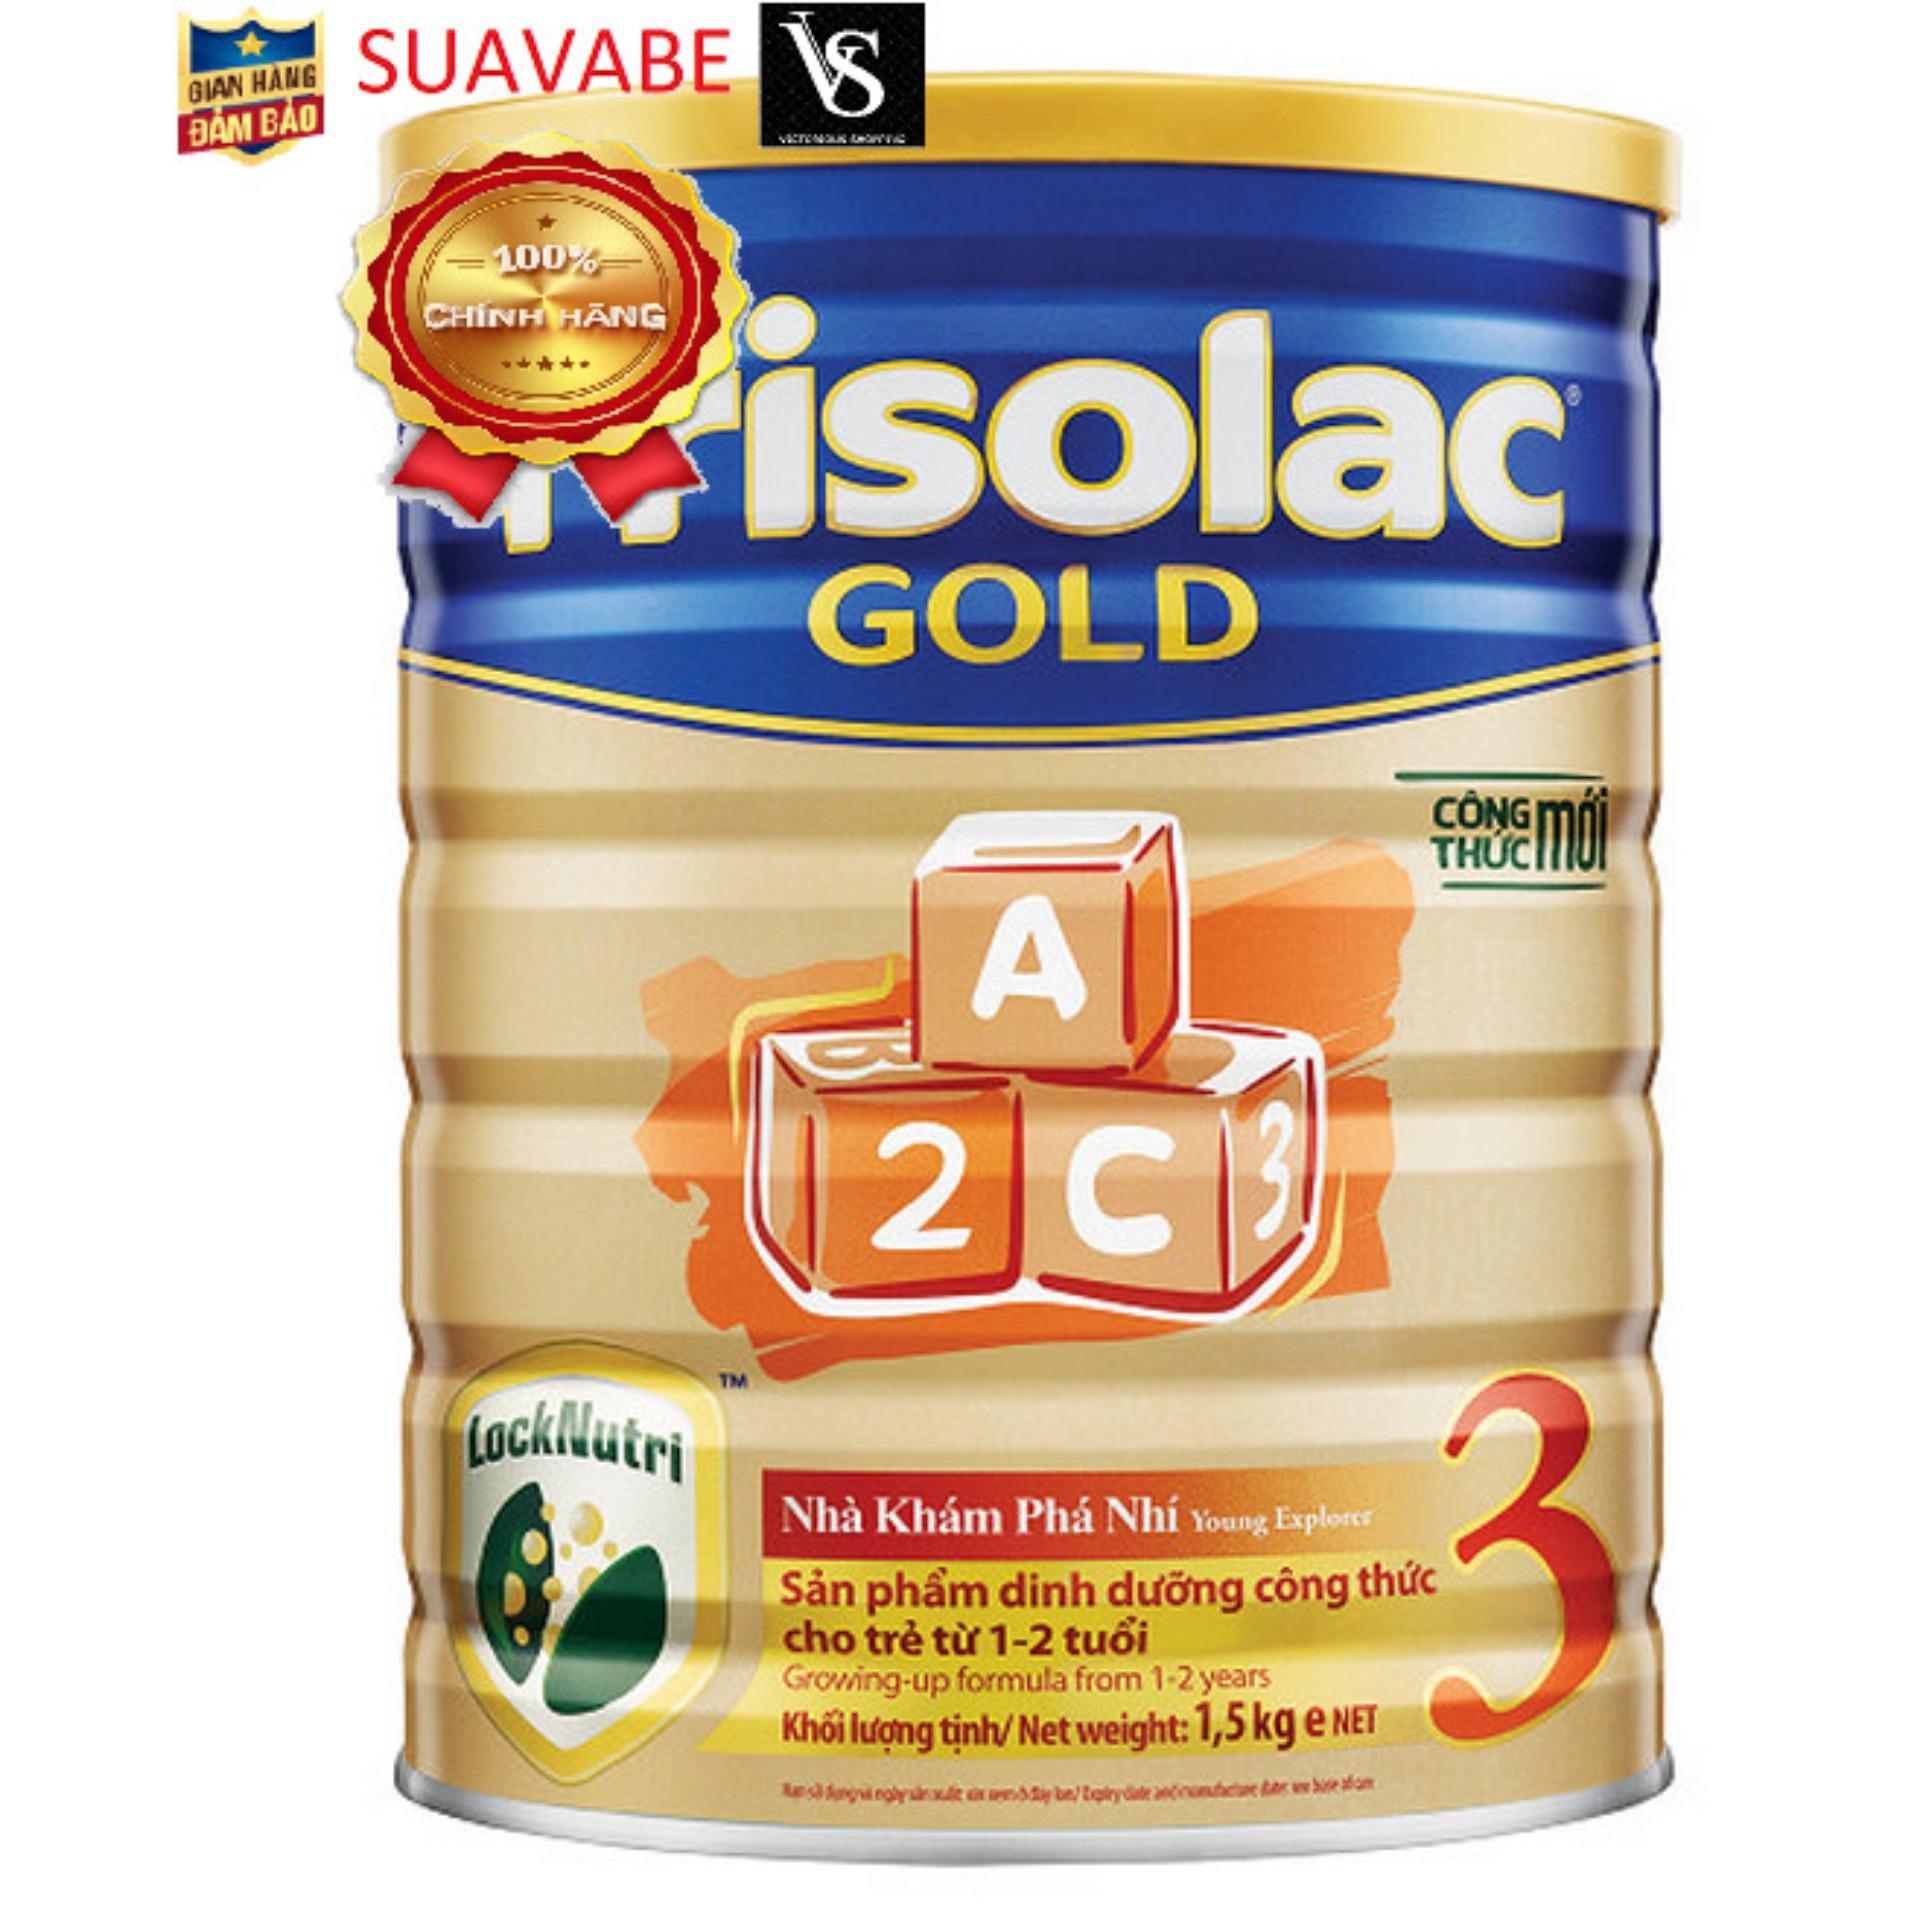 Sữa bột Friso Gold 3 1500kg 2016